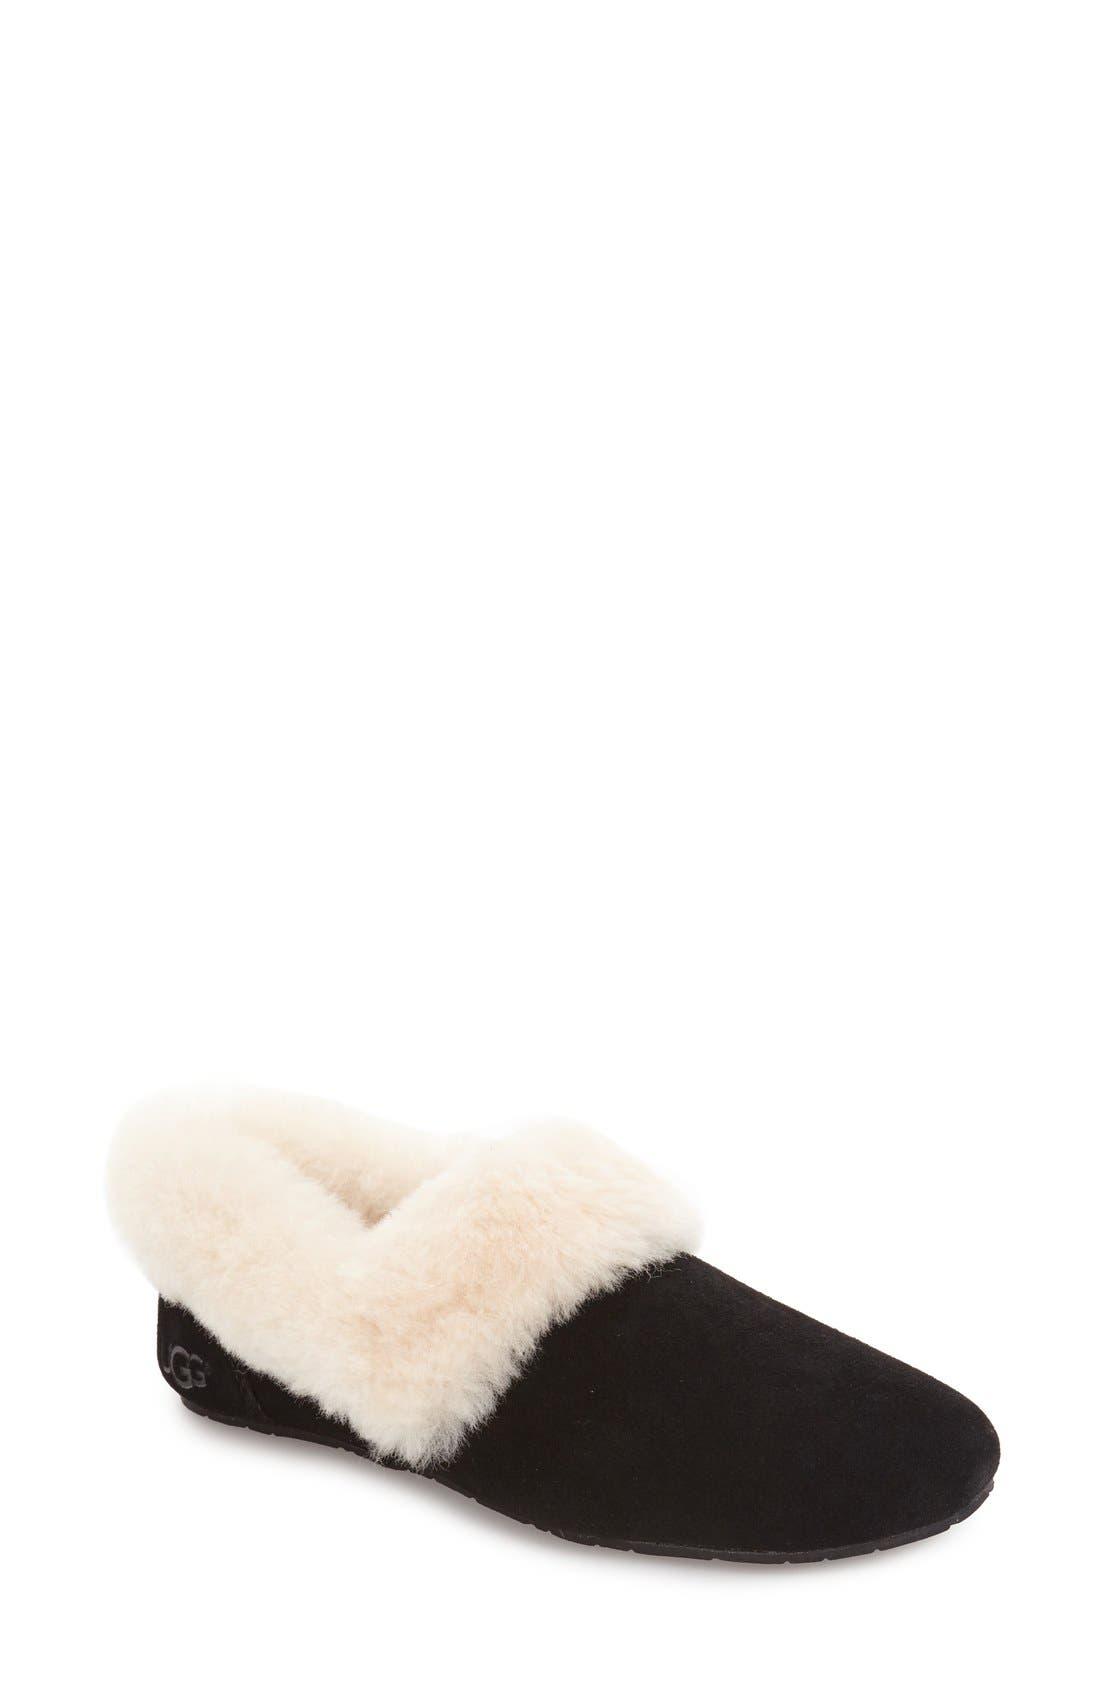 Alternate Image 1 Selected - UGG® Kendyl Genuine Shearling Slipper (Women)